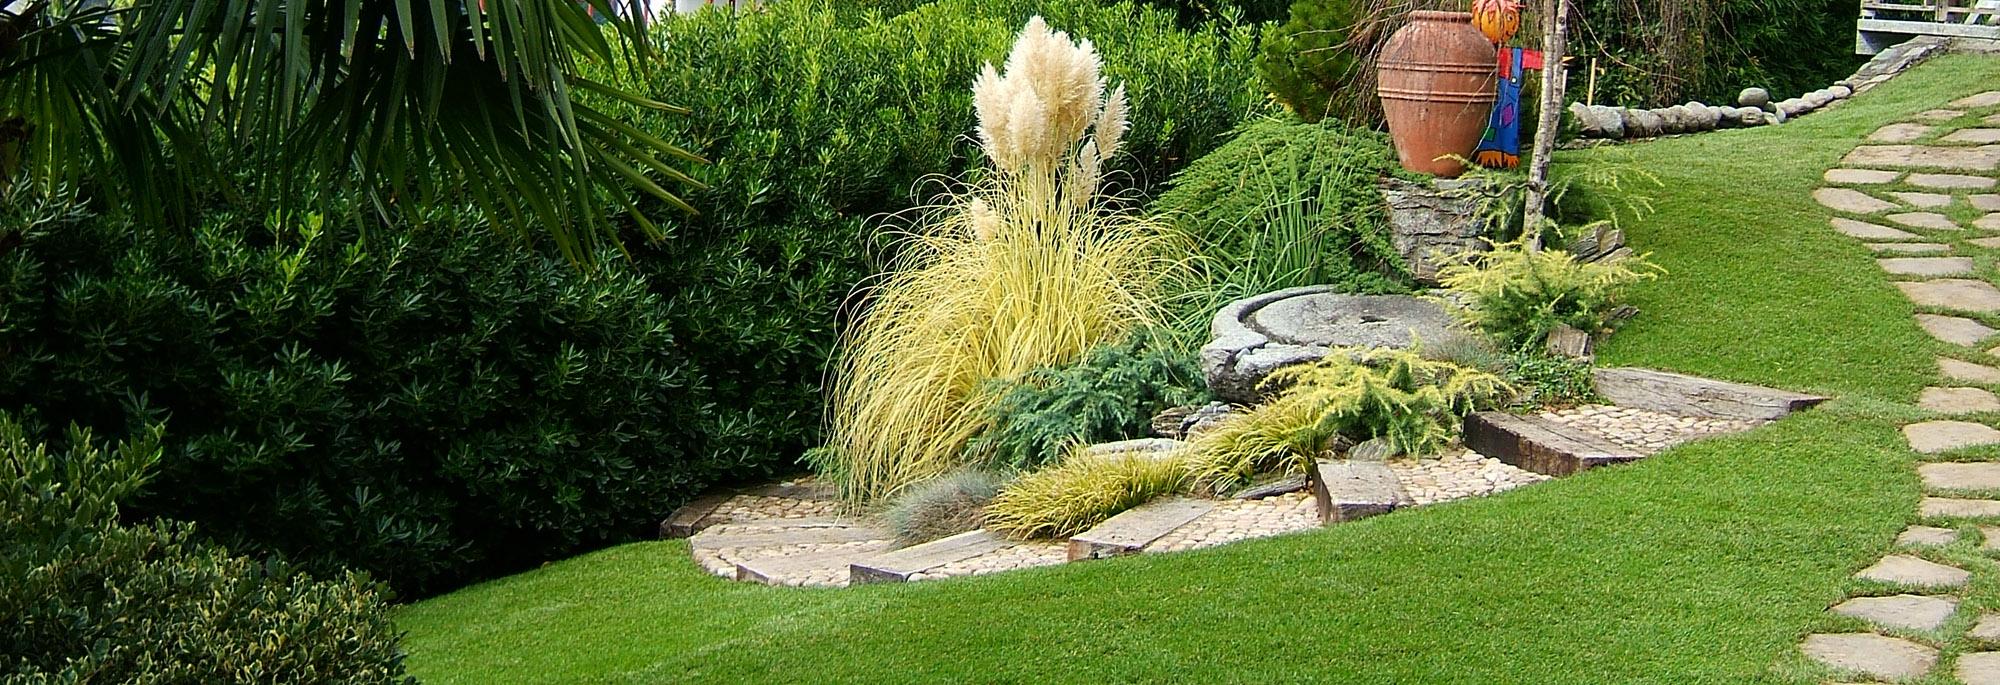 Sfondo giardini vivai fiordelmondo for Esempi di giardini